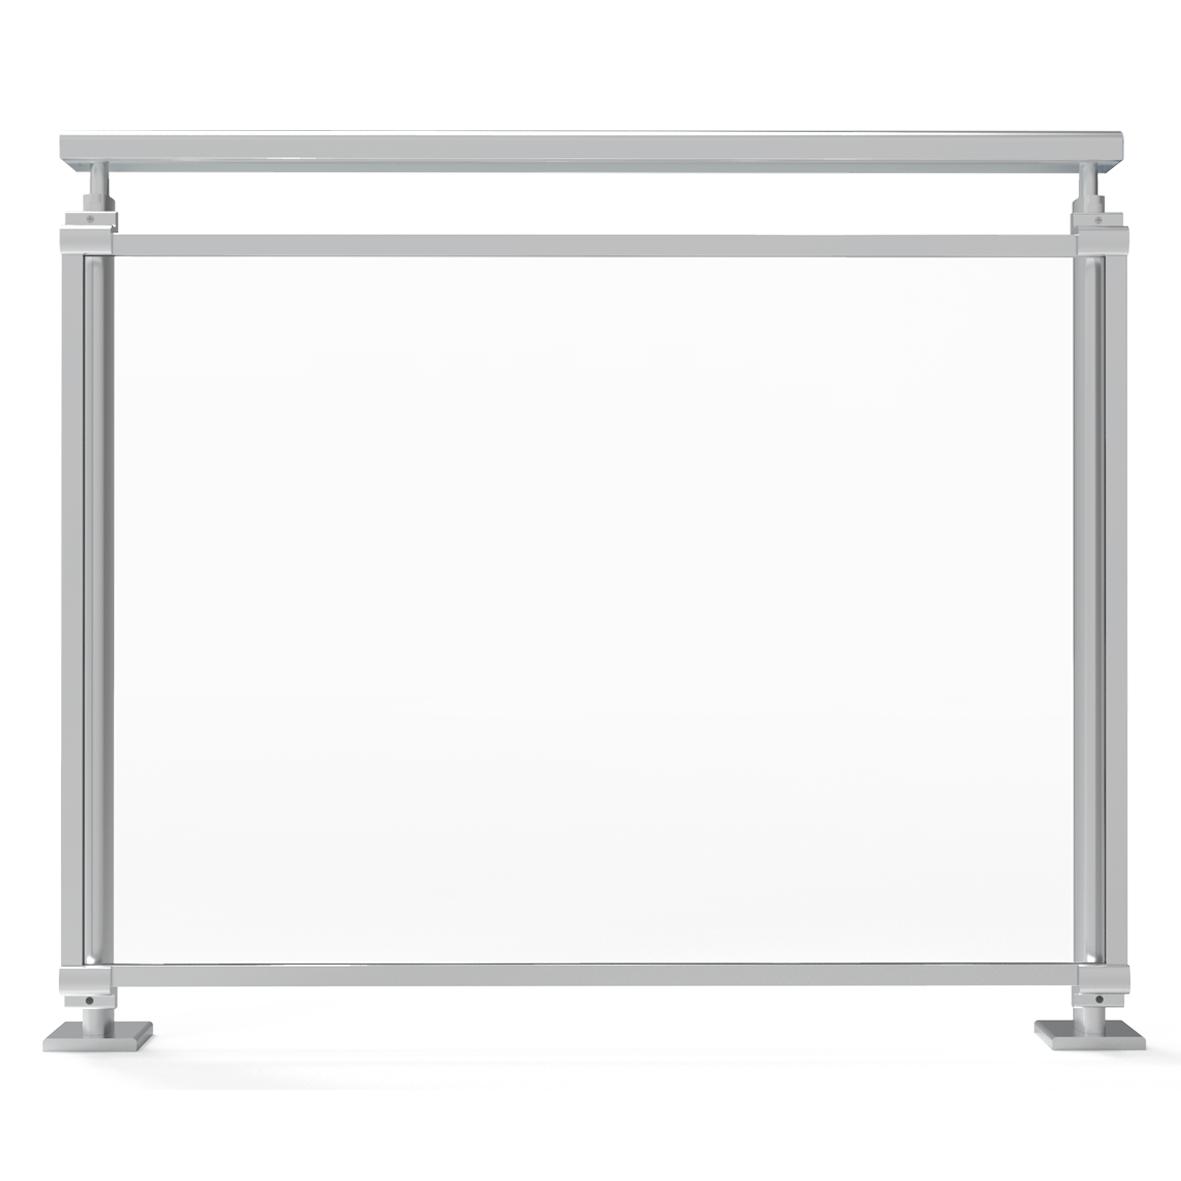 https://www.allpaint.it/wp-content/uploads/2021/07/ringhiere-alluminio-glass-support-allpaint.jpg